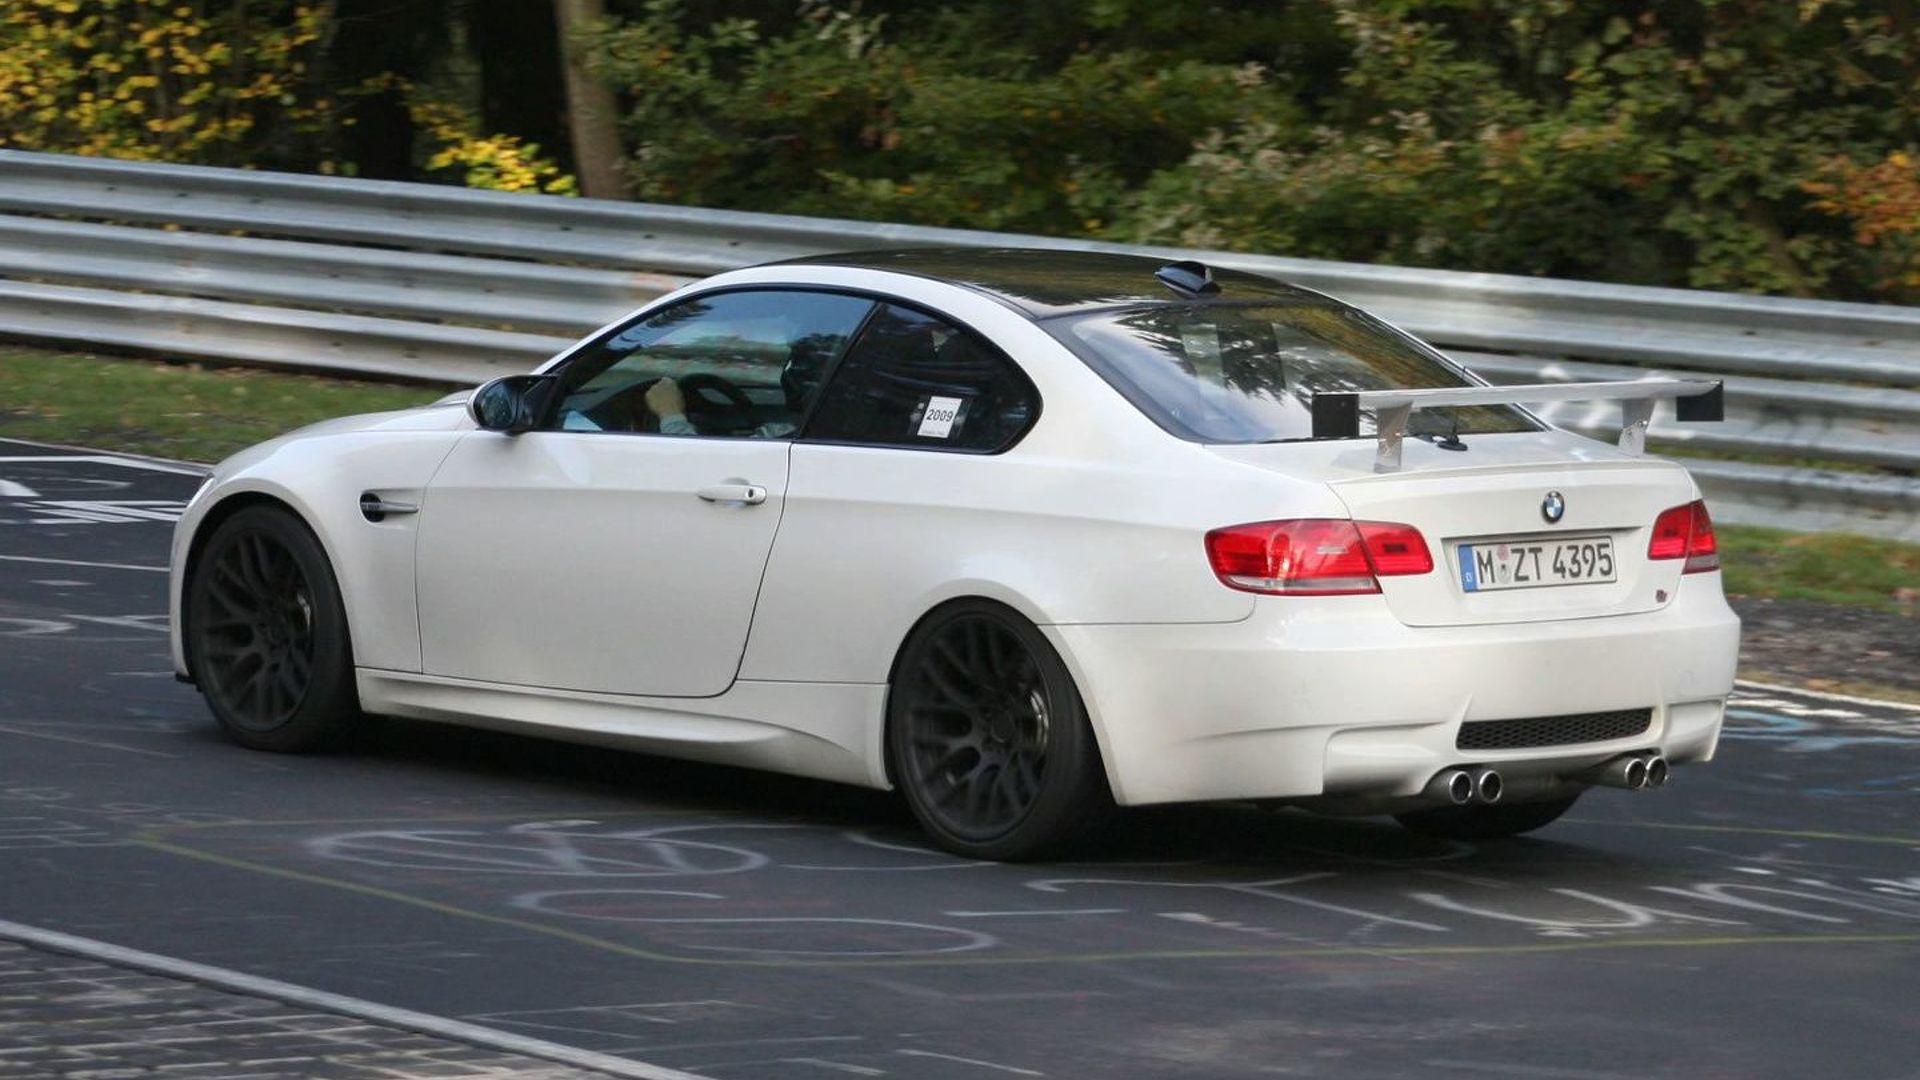 Mystery Hardcore BMW M3: Spy Video & More Photos